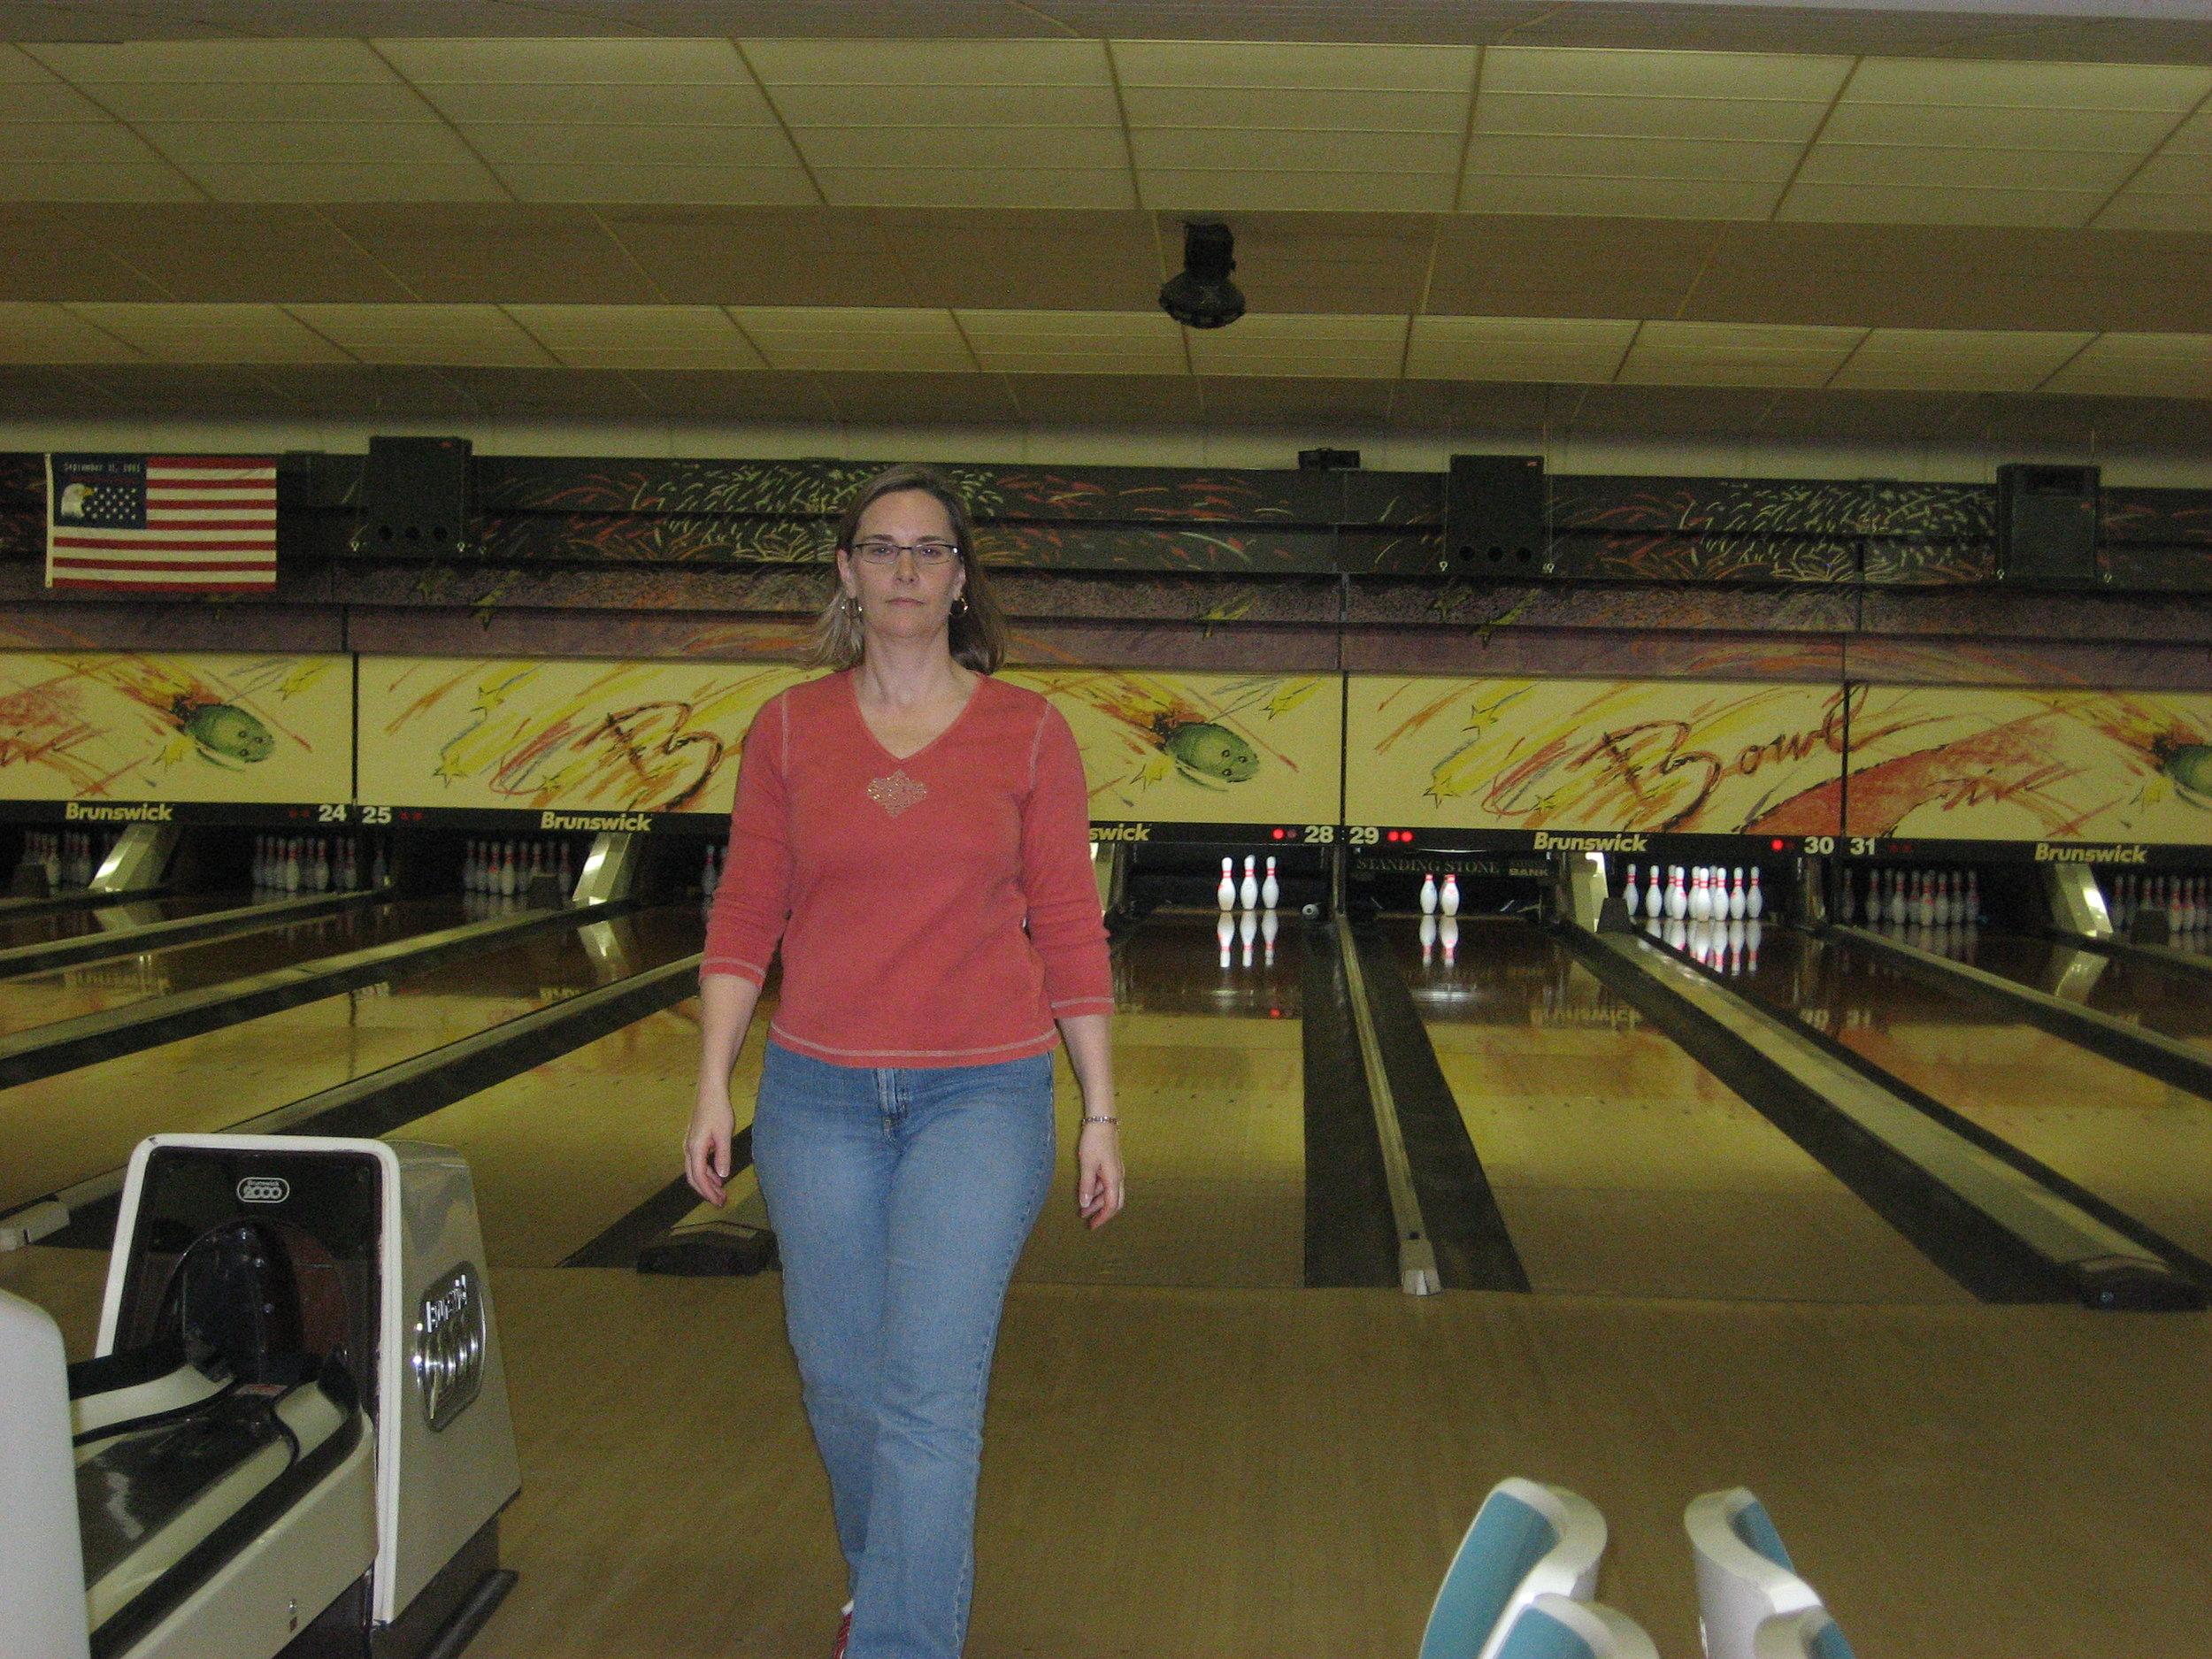 bowling2009tammy.JPG